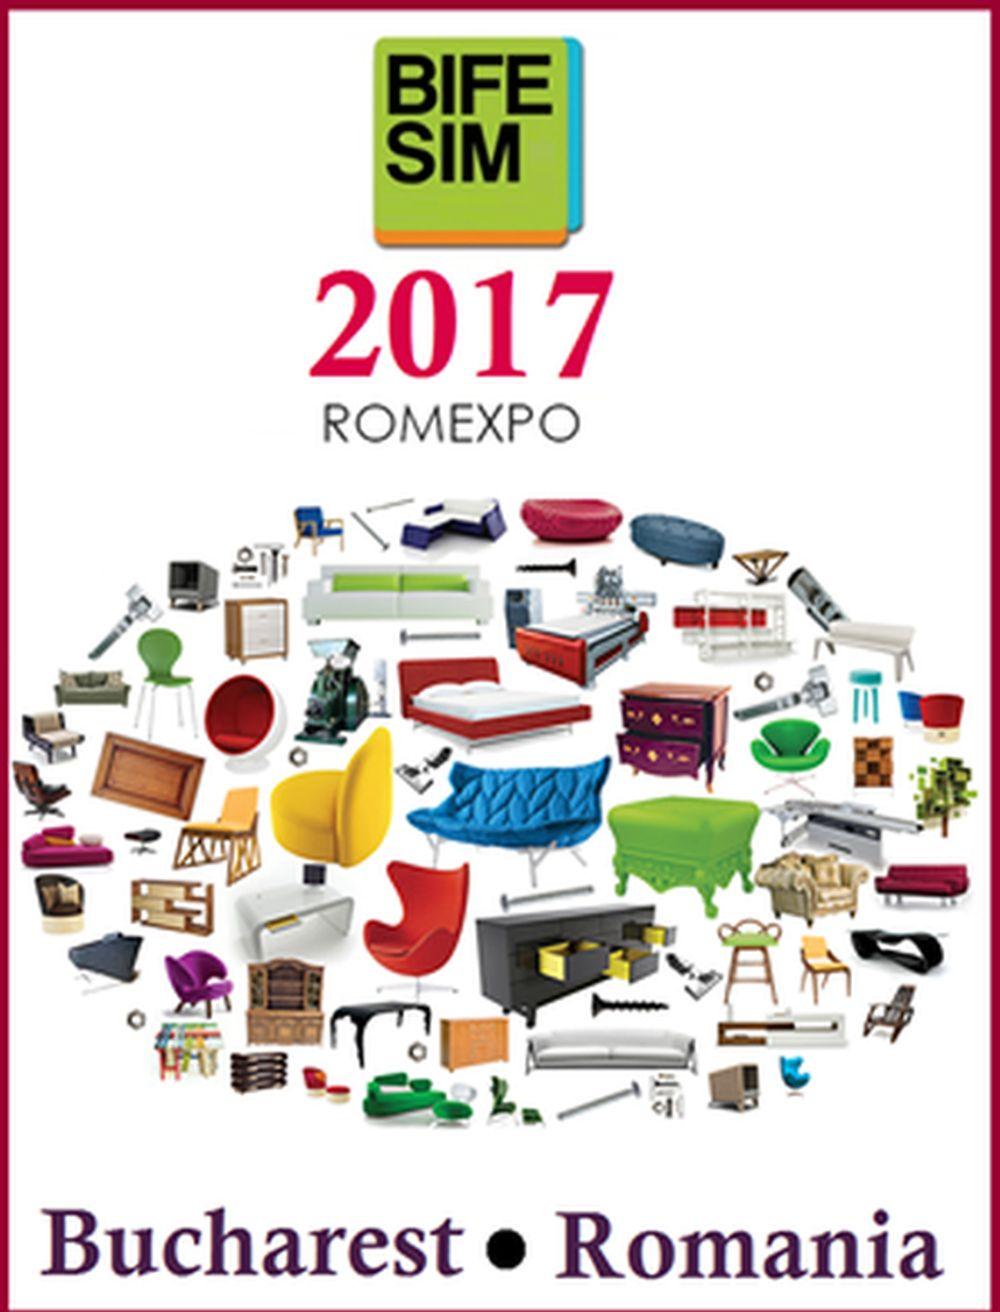 adelaparvu-com-despre-targuri-de-design-2017-bife-sim-2017-poster